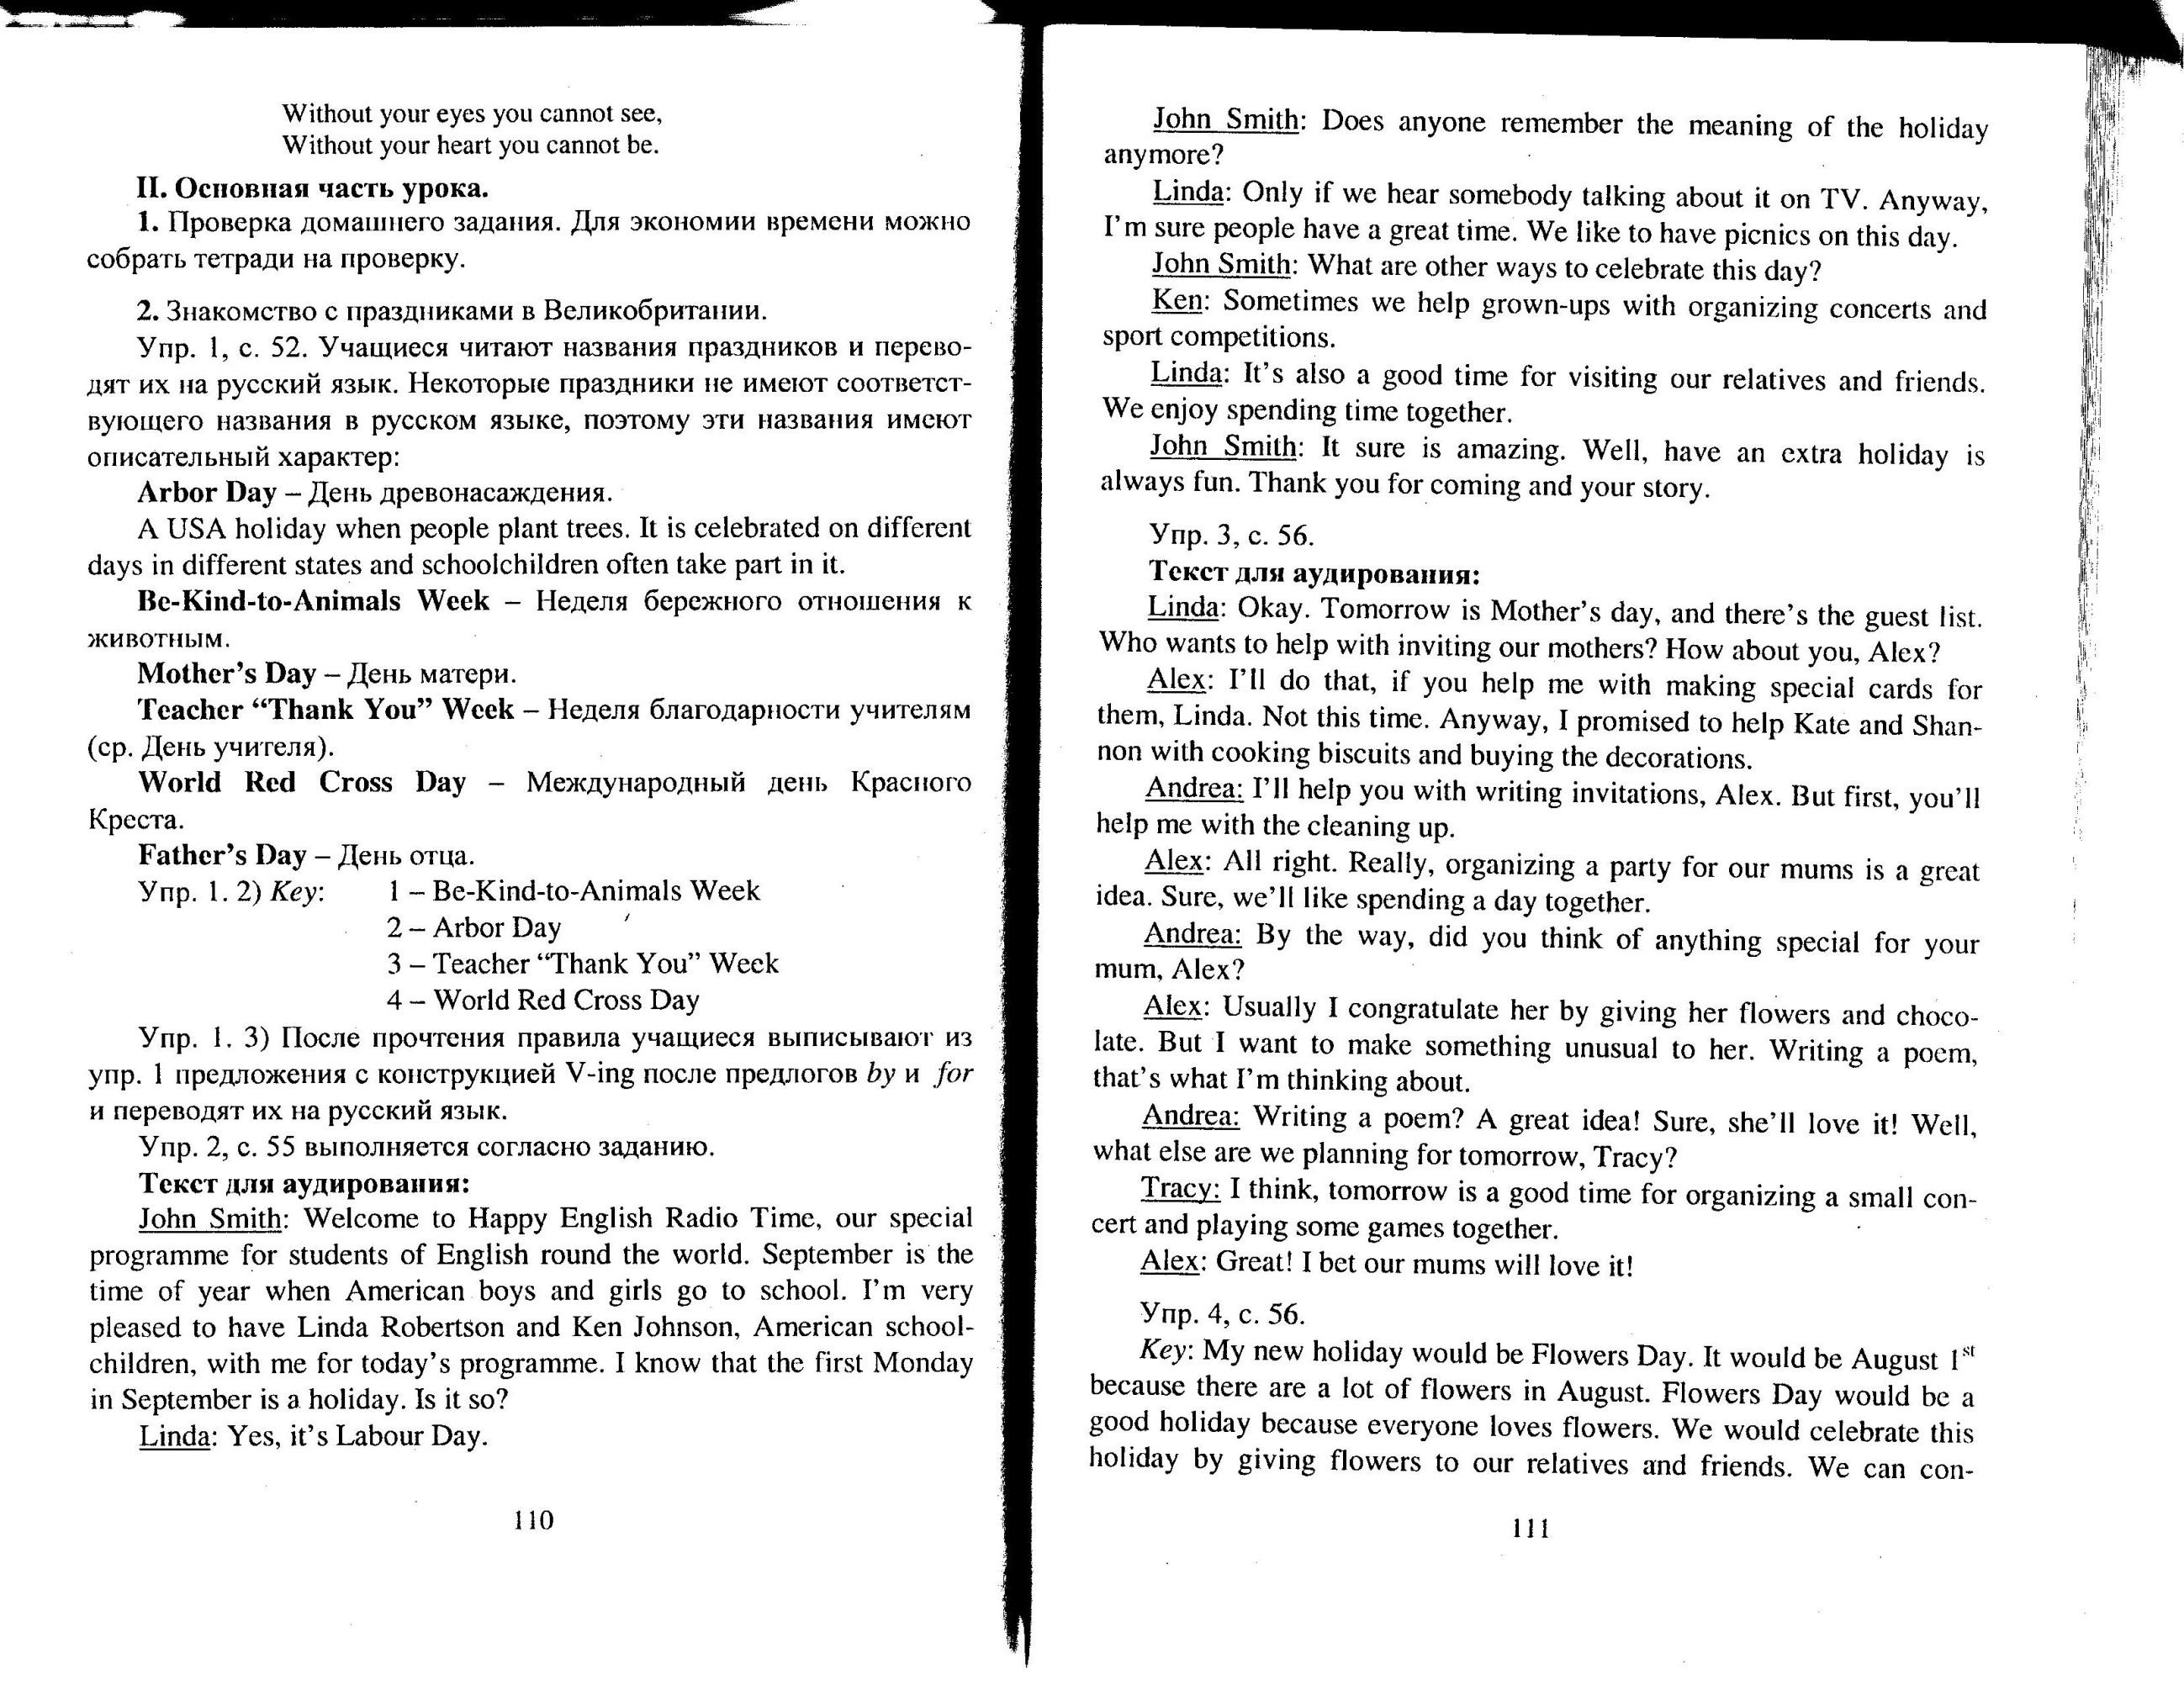 C:\Users\Грузиновская СОШ\Documents\Scanned Documents\Рисунок (333).jpg